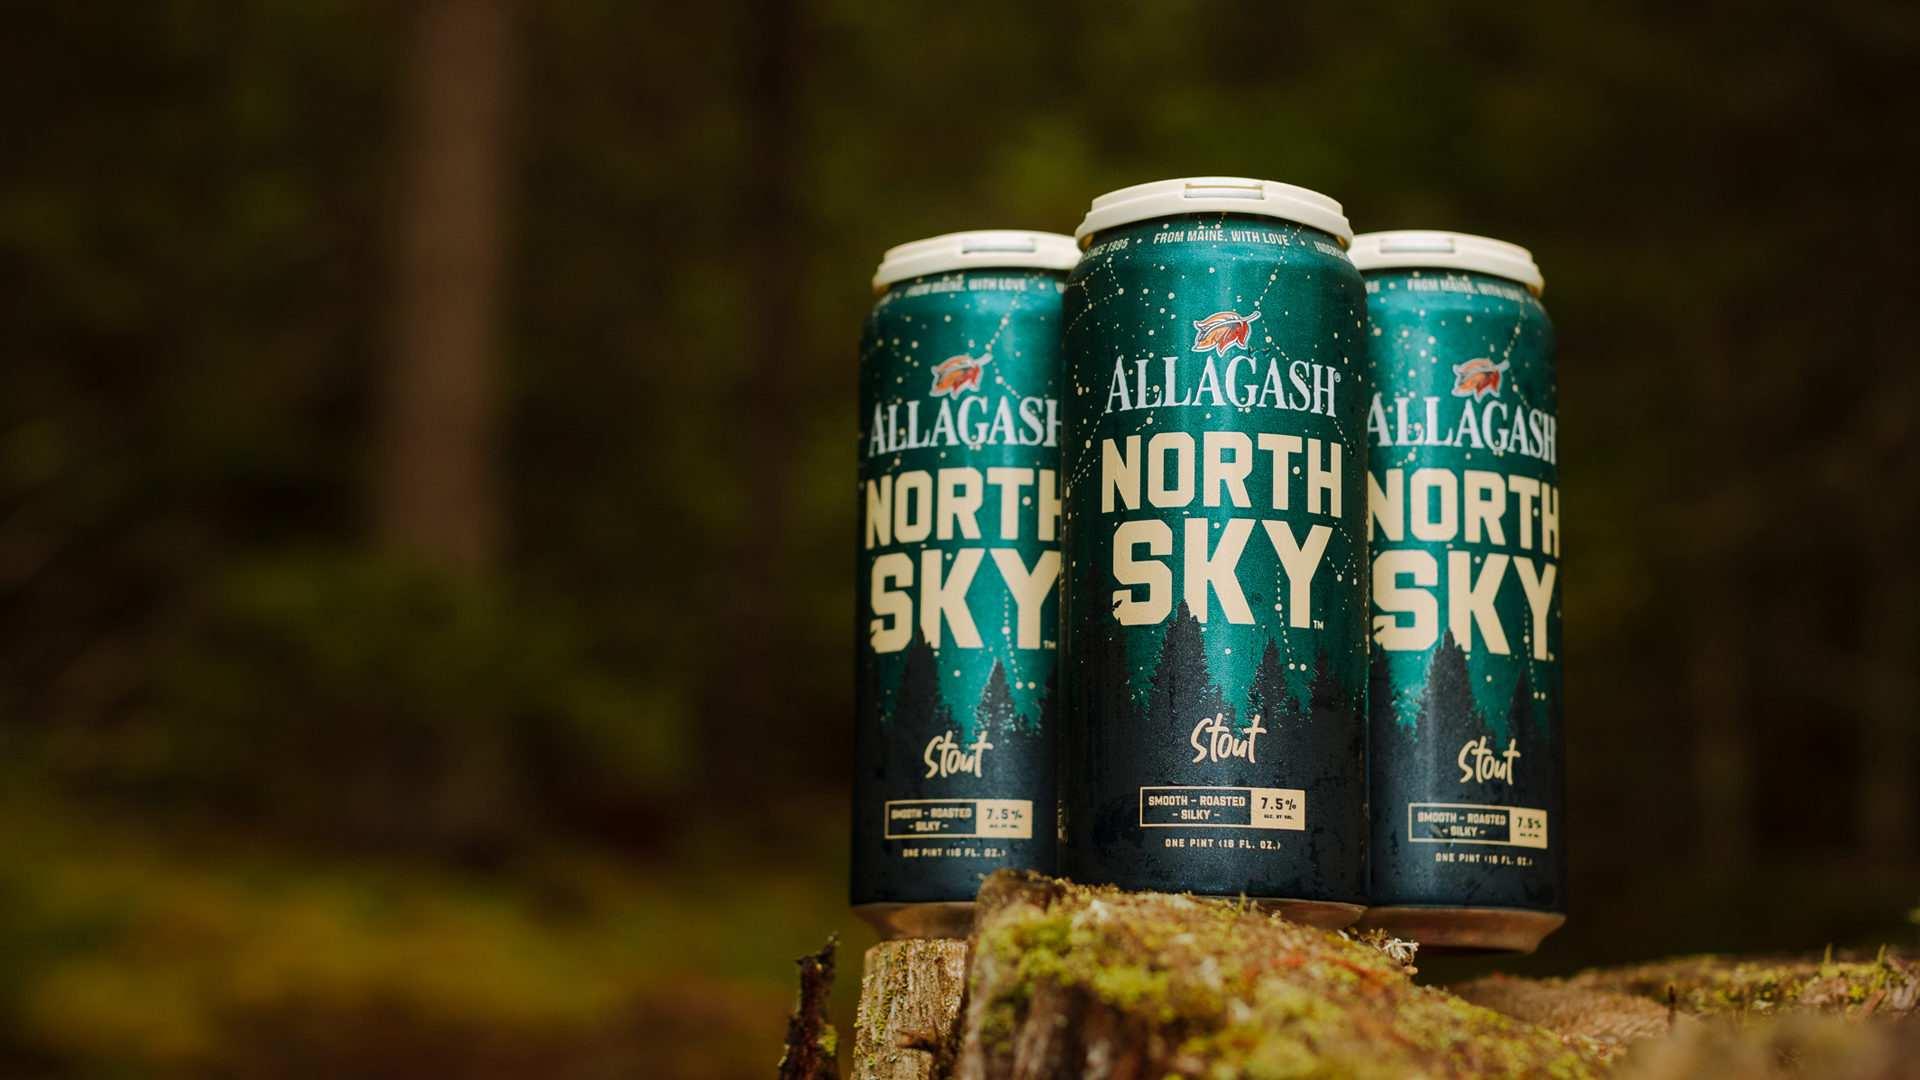 Allagash North Sky Stout